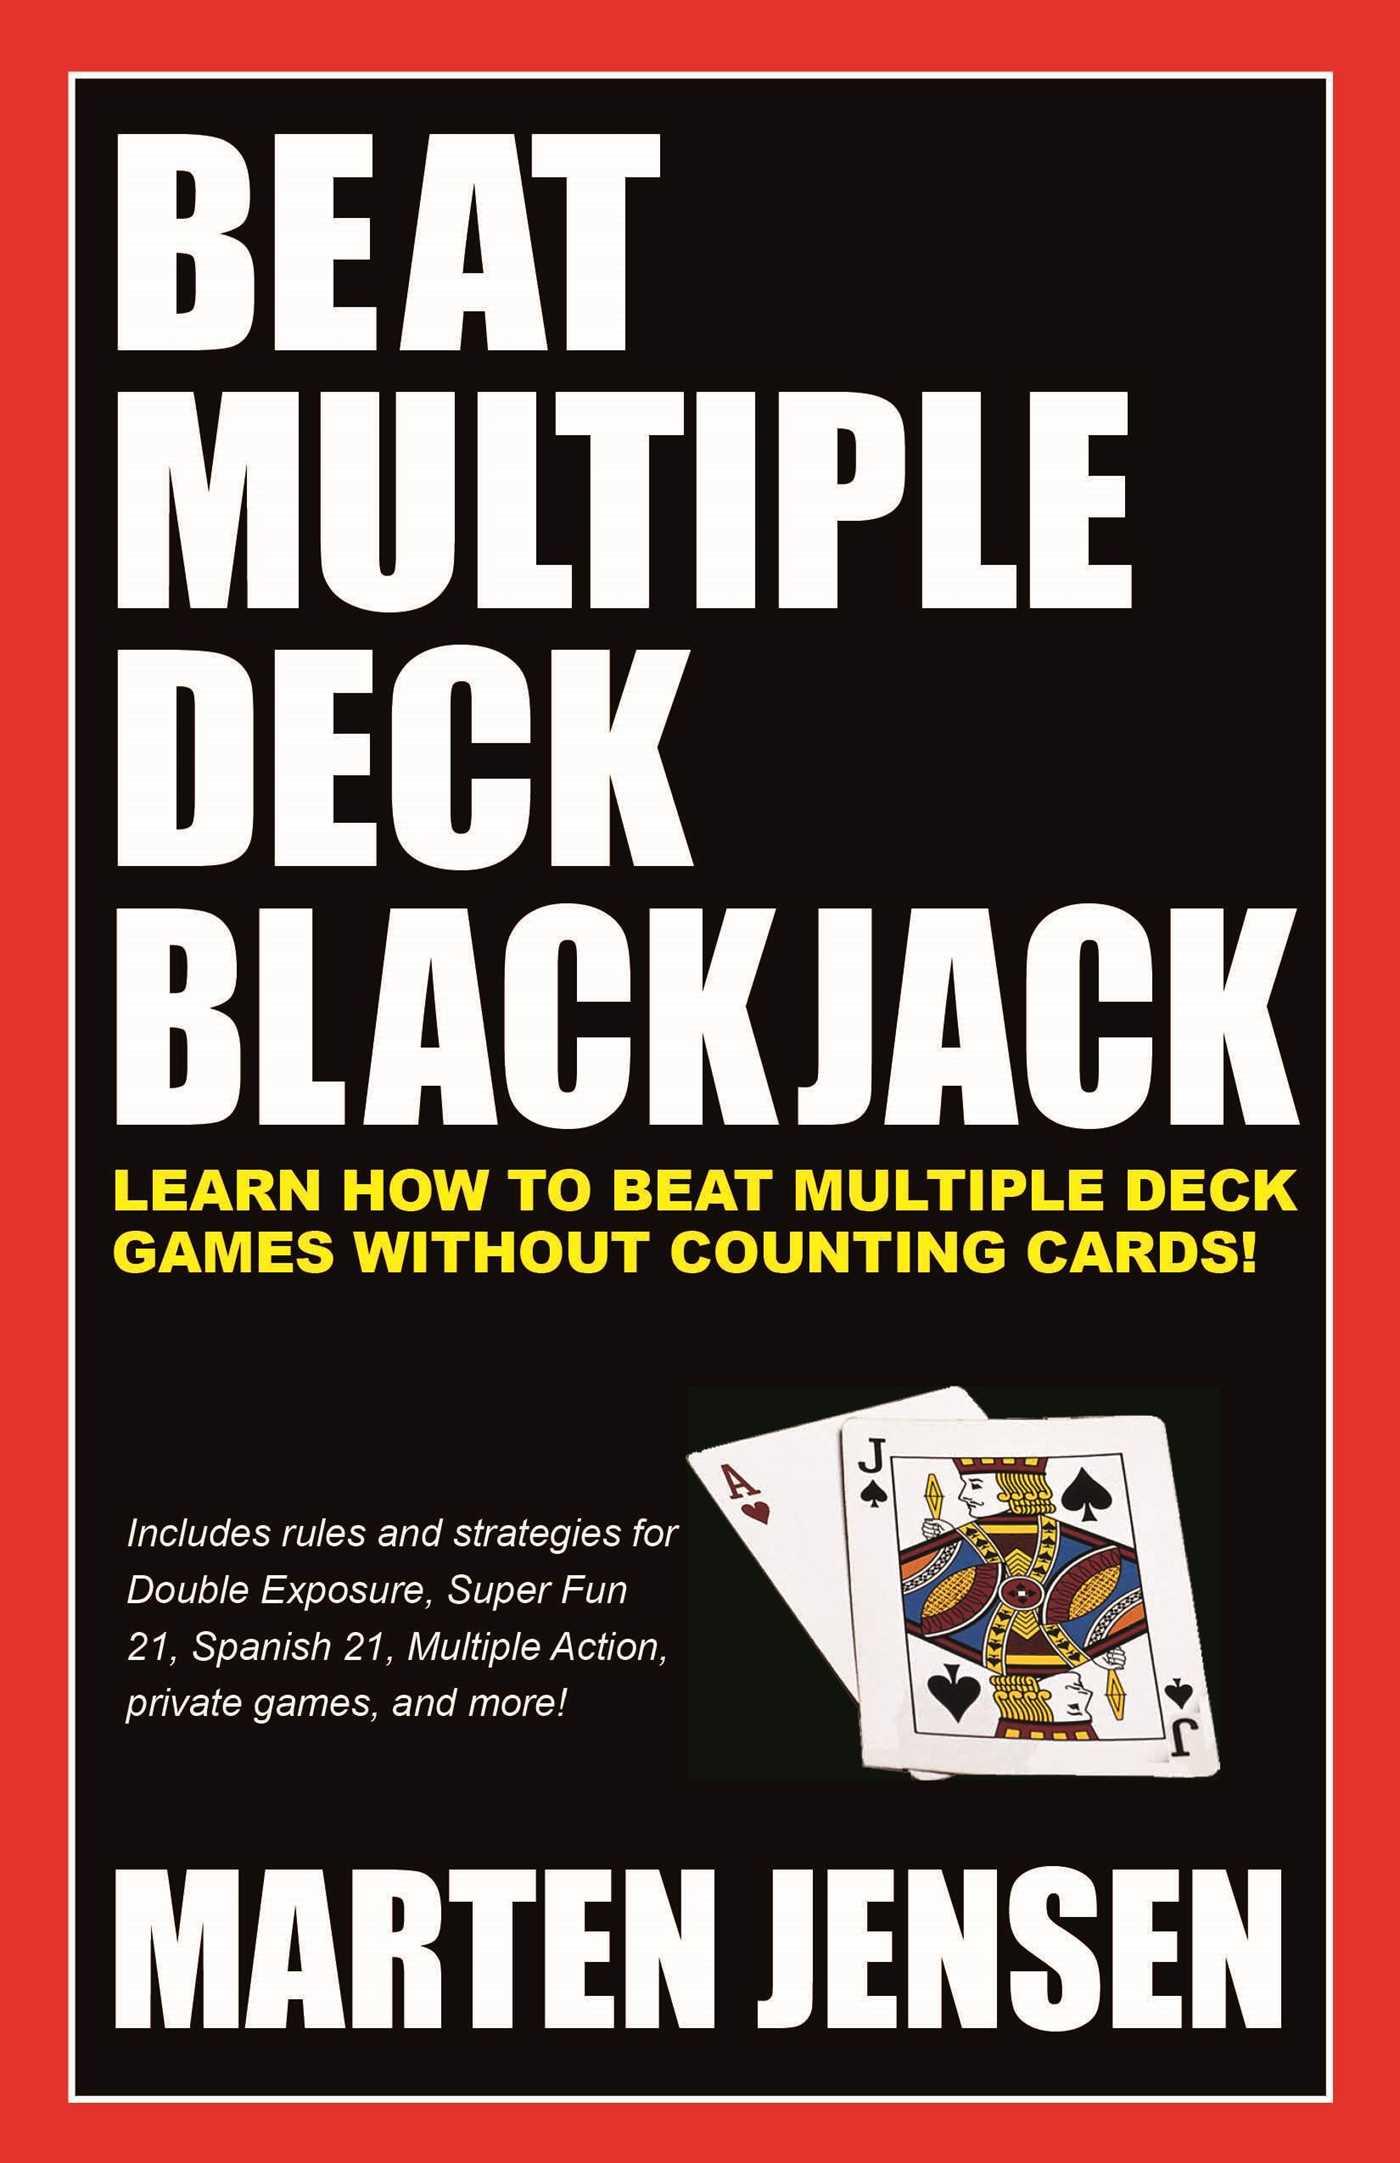 Beat multiple deck blackjack 9781580423564 hr